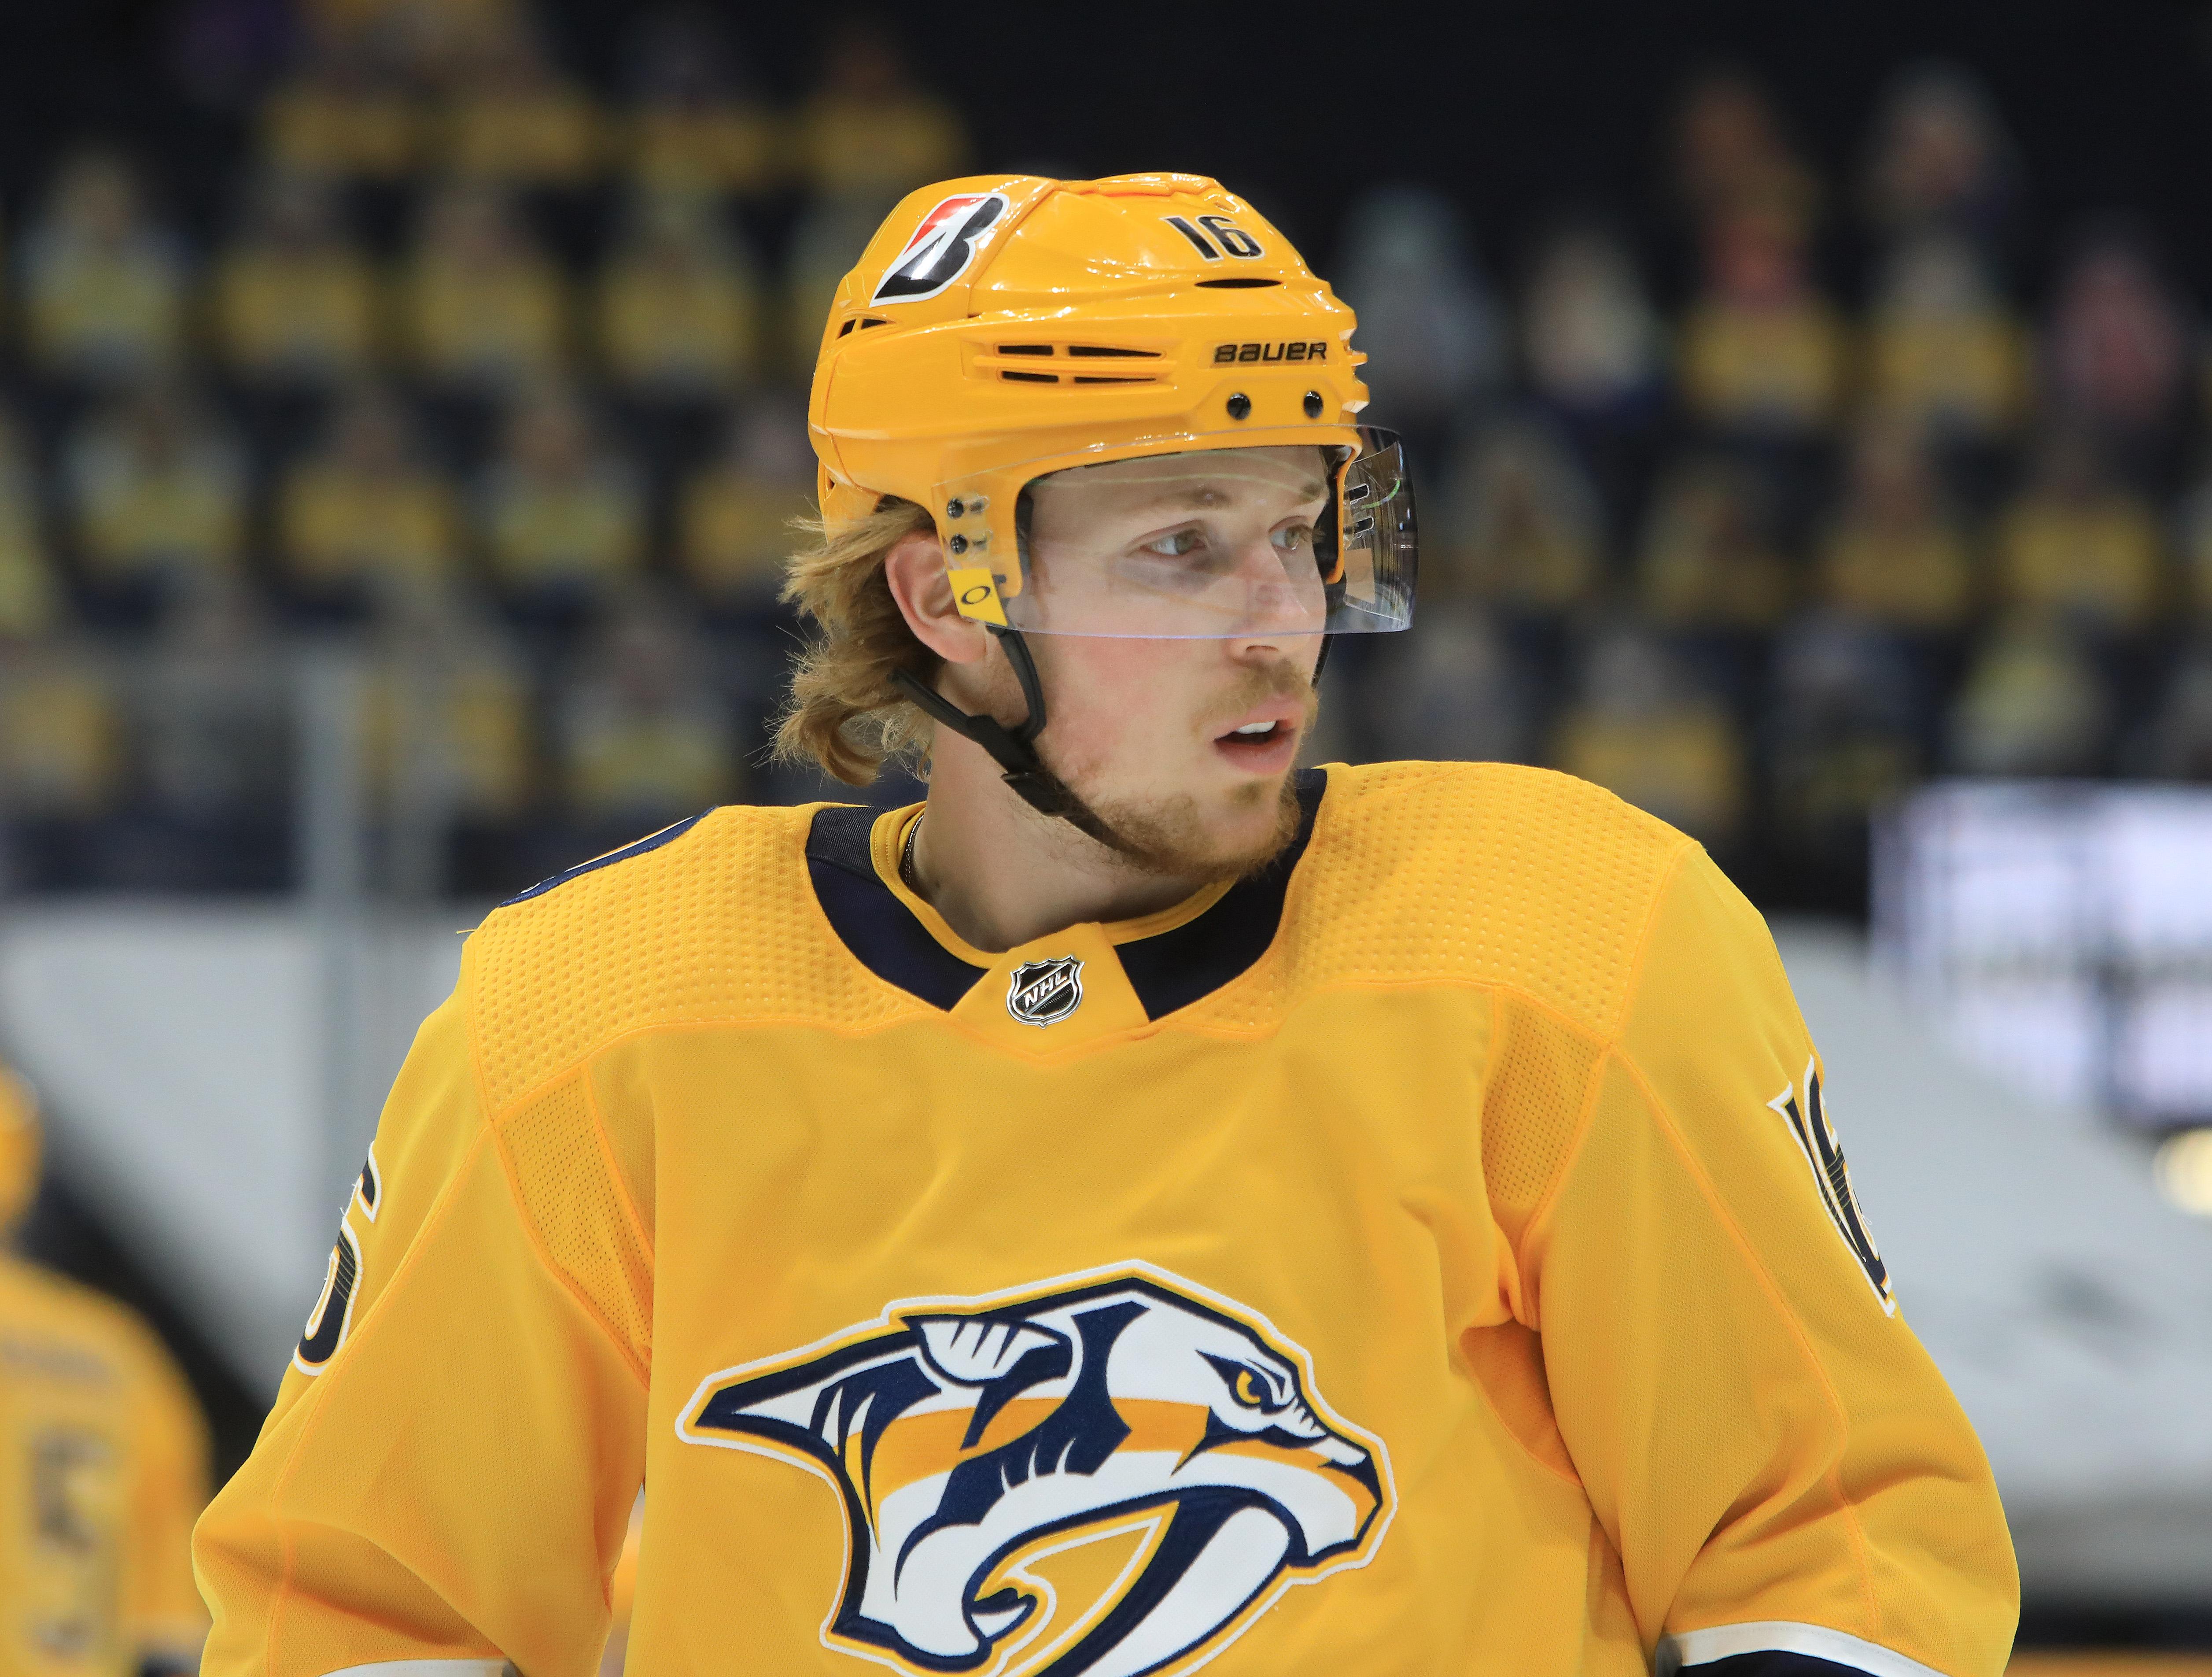 NHL: APR 13 Lightning at Predators